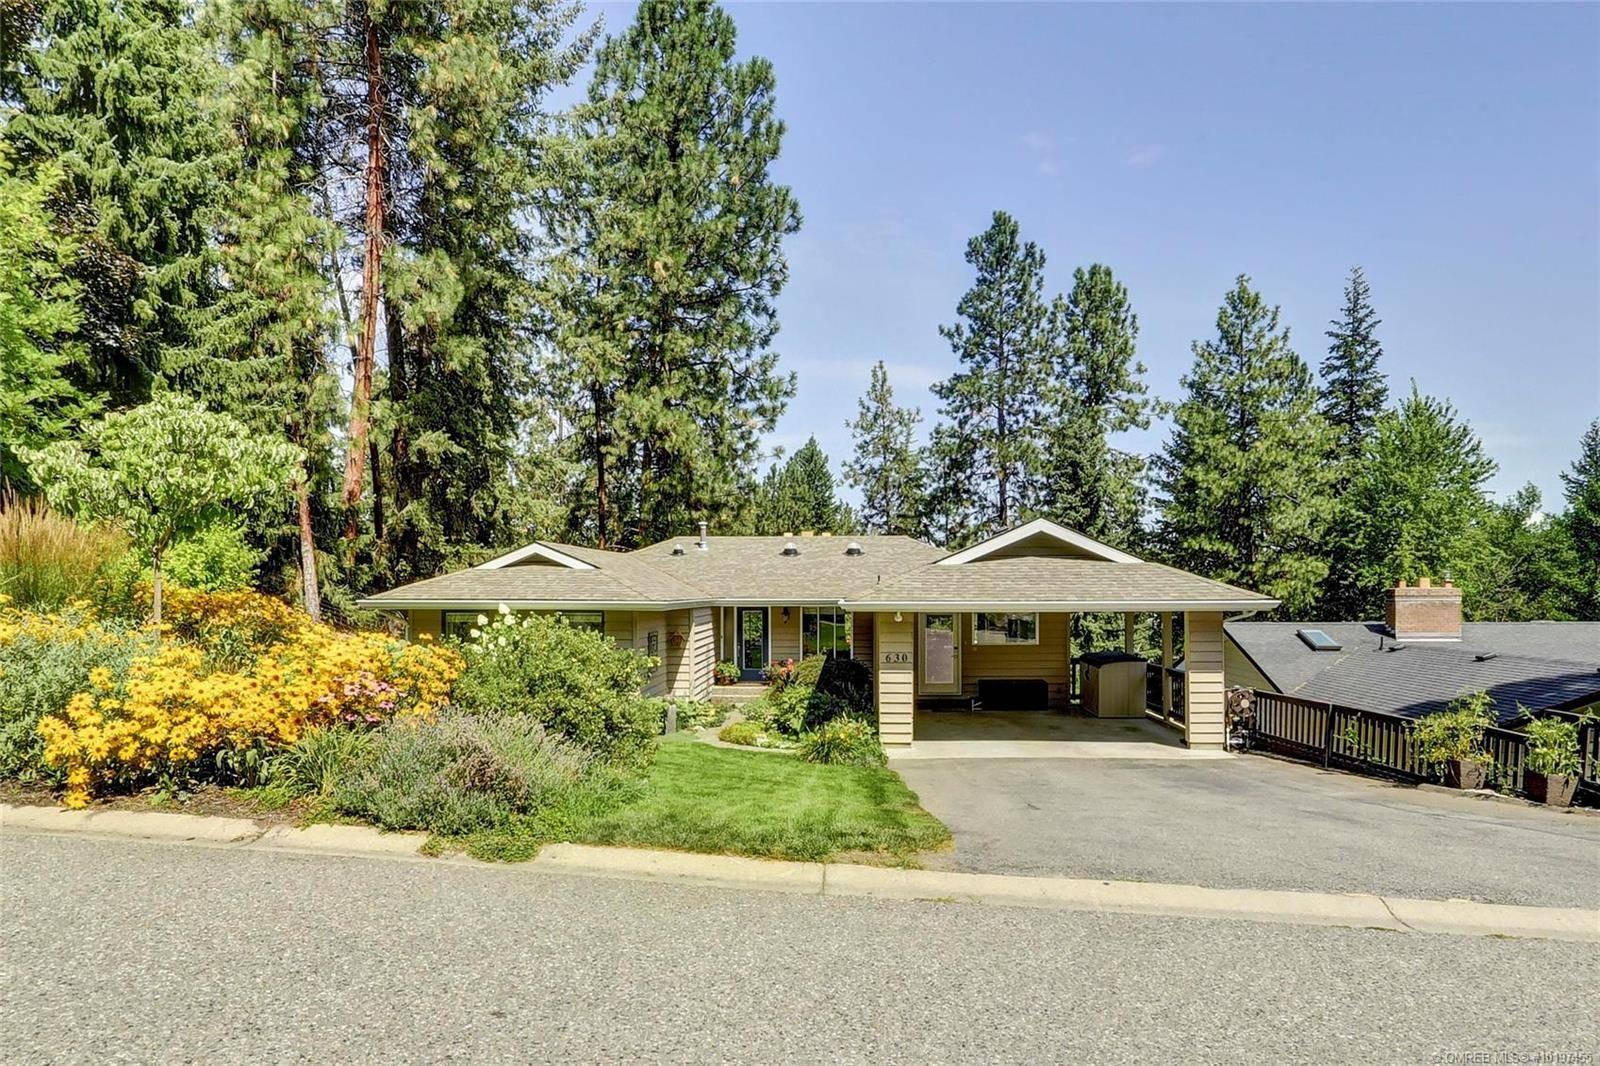 House for sale at 630 Thorneloe Rd Kelowna British Columbia - MLS: 10197455